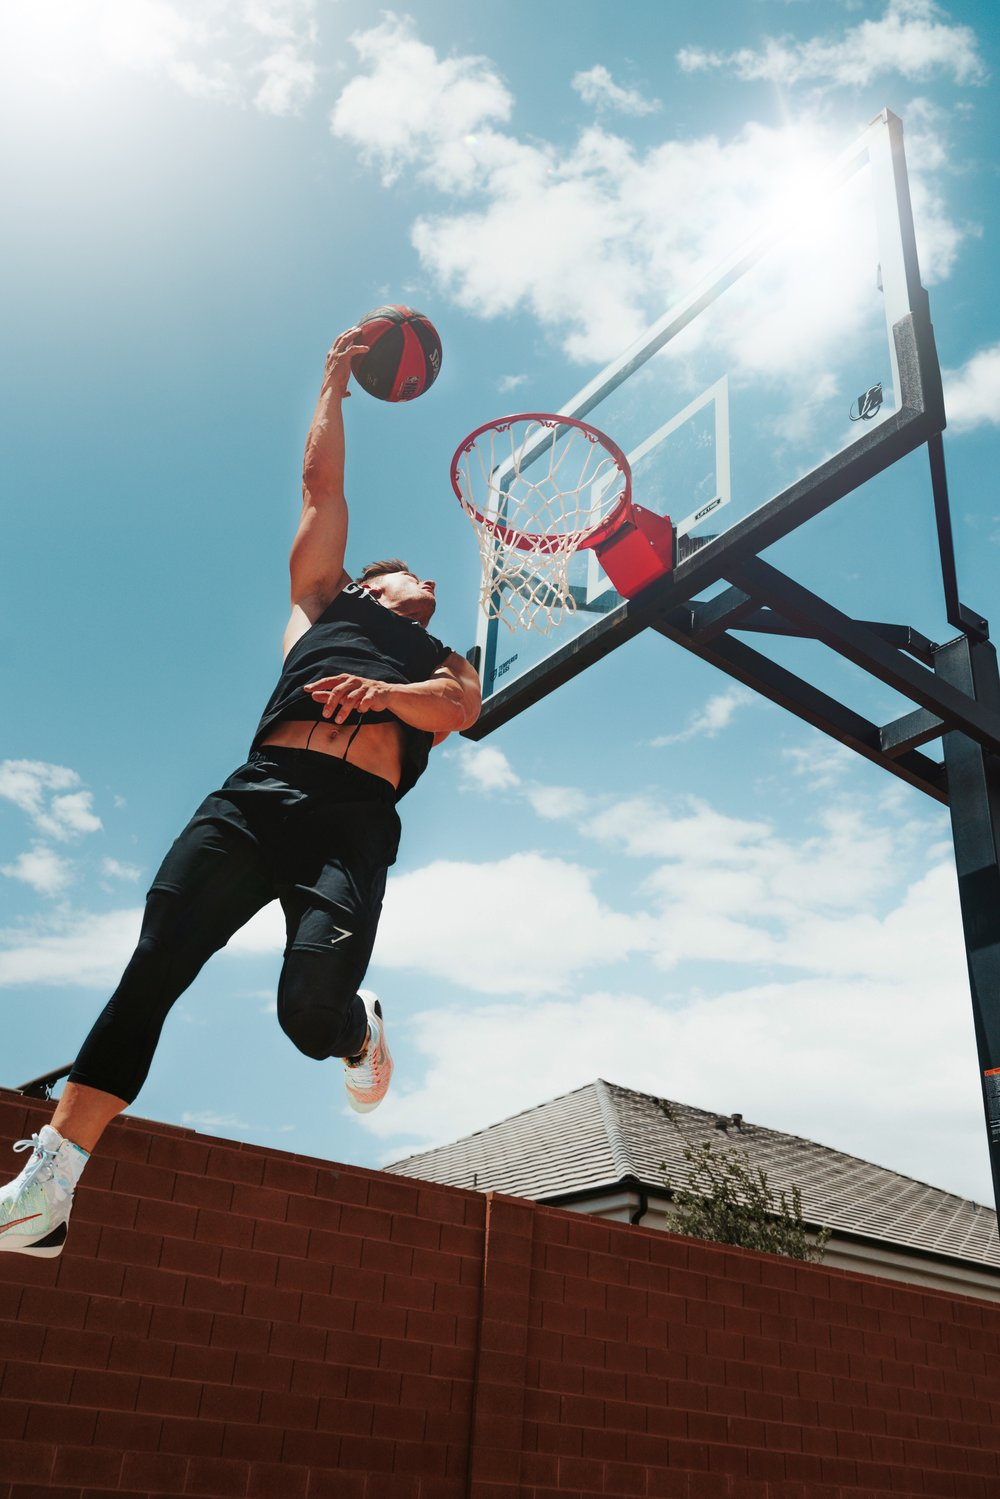 Idealize Sports With Aplicativo Bet365 Para Aposta